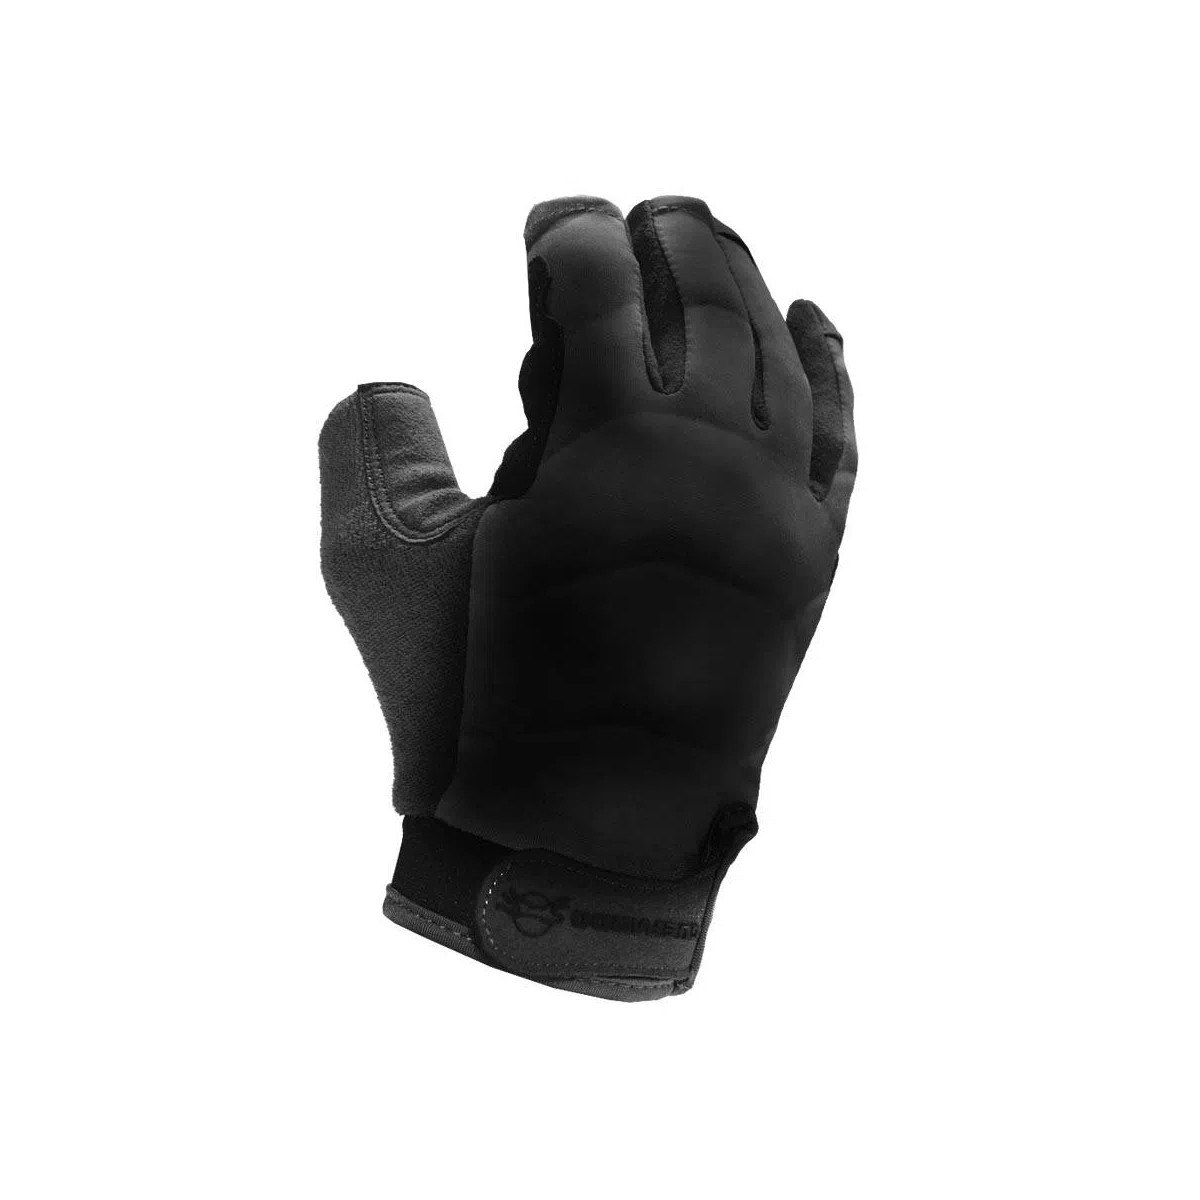 Luva Breeze Black Guepardo